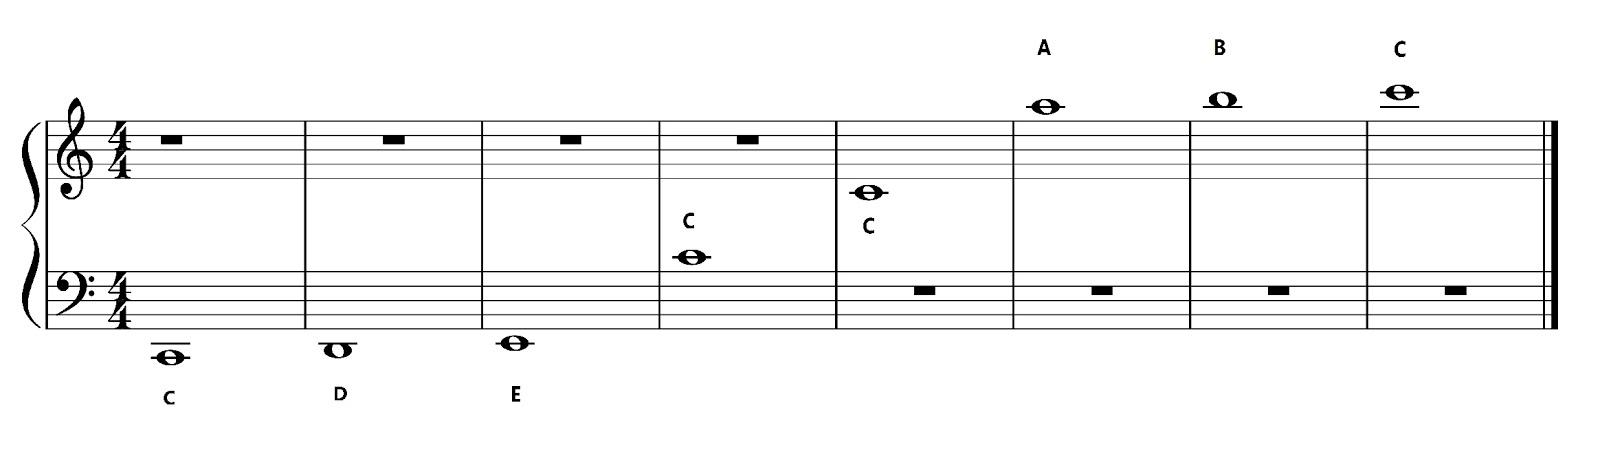 Musiconlineuk Lesson 2 1 Ledger Lines